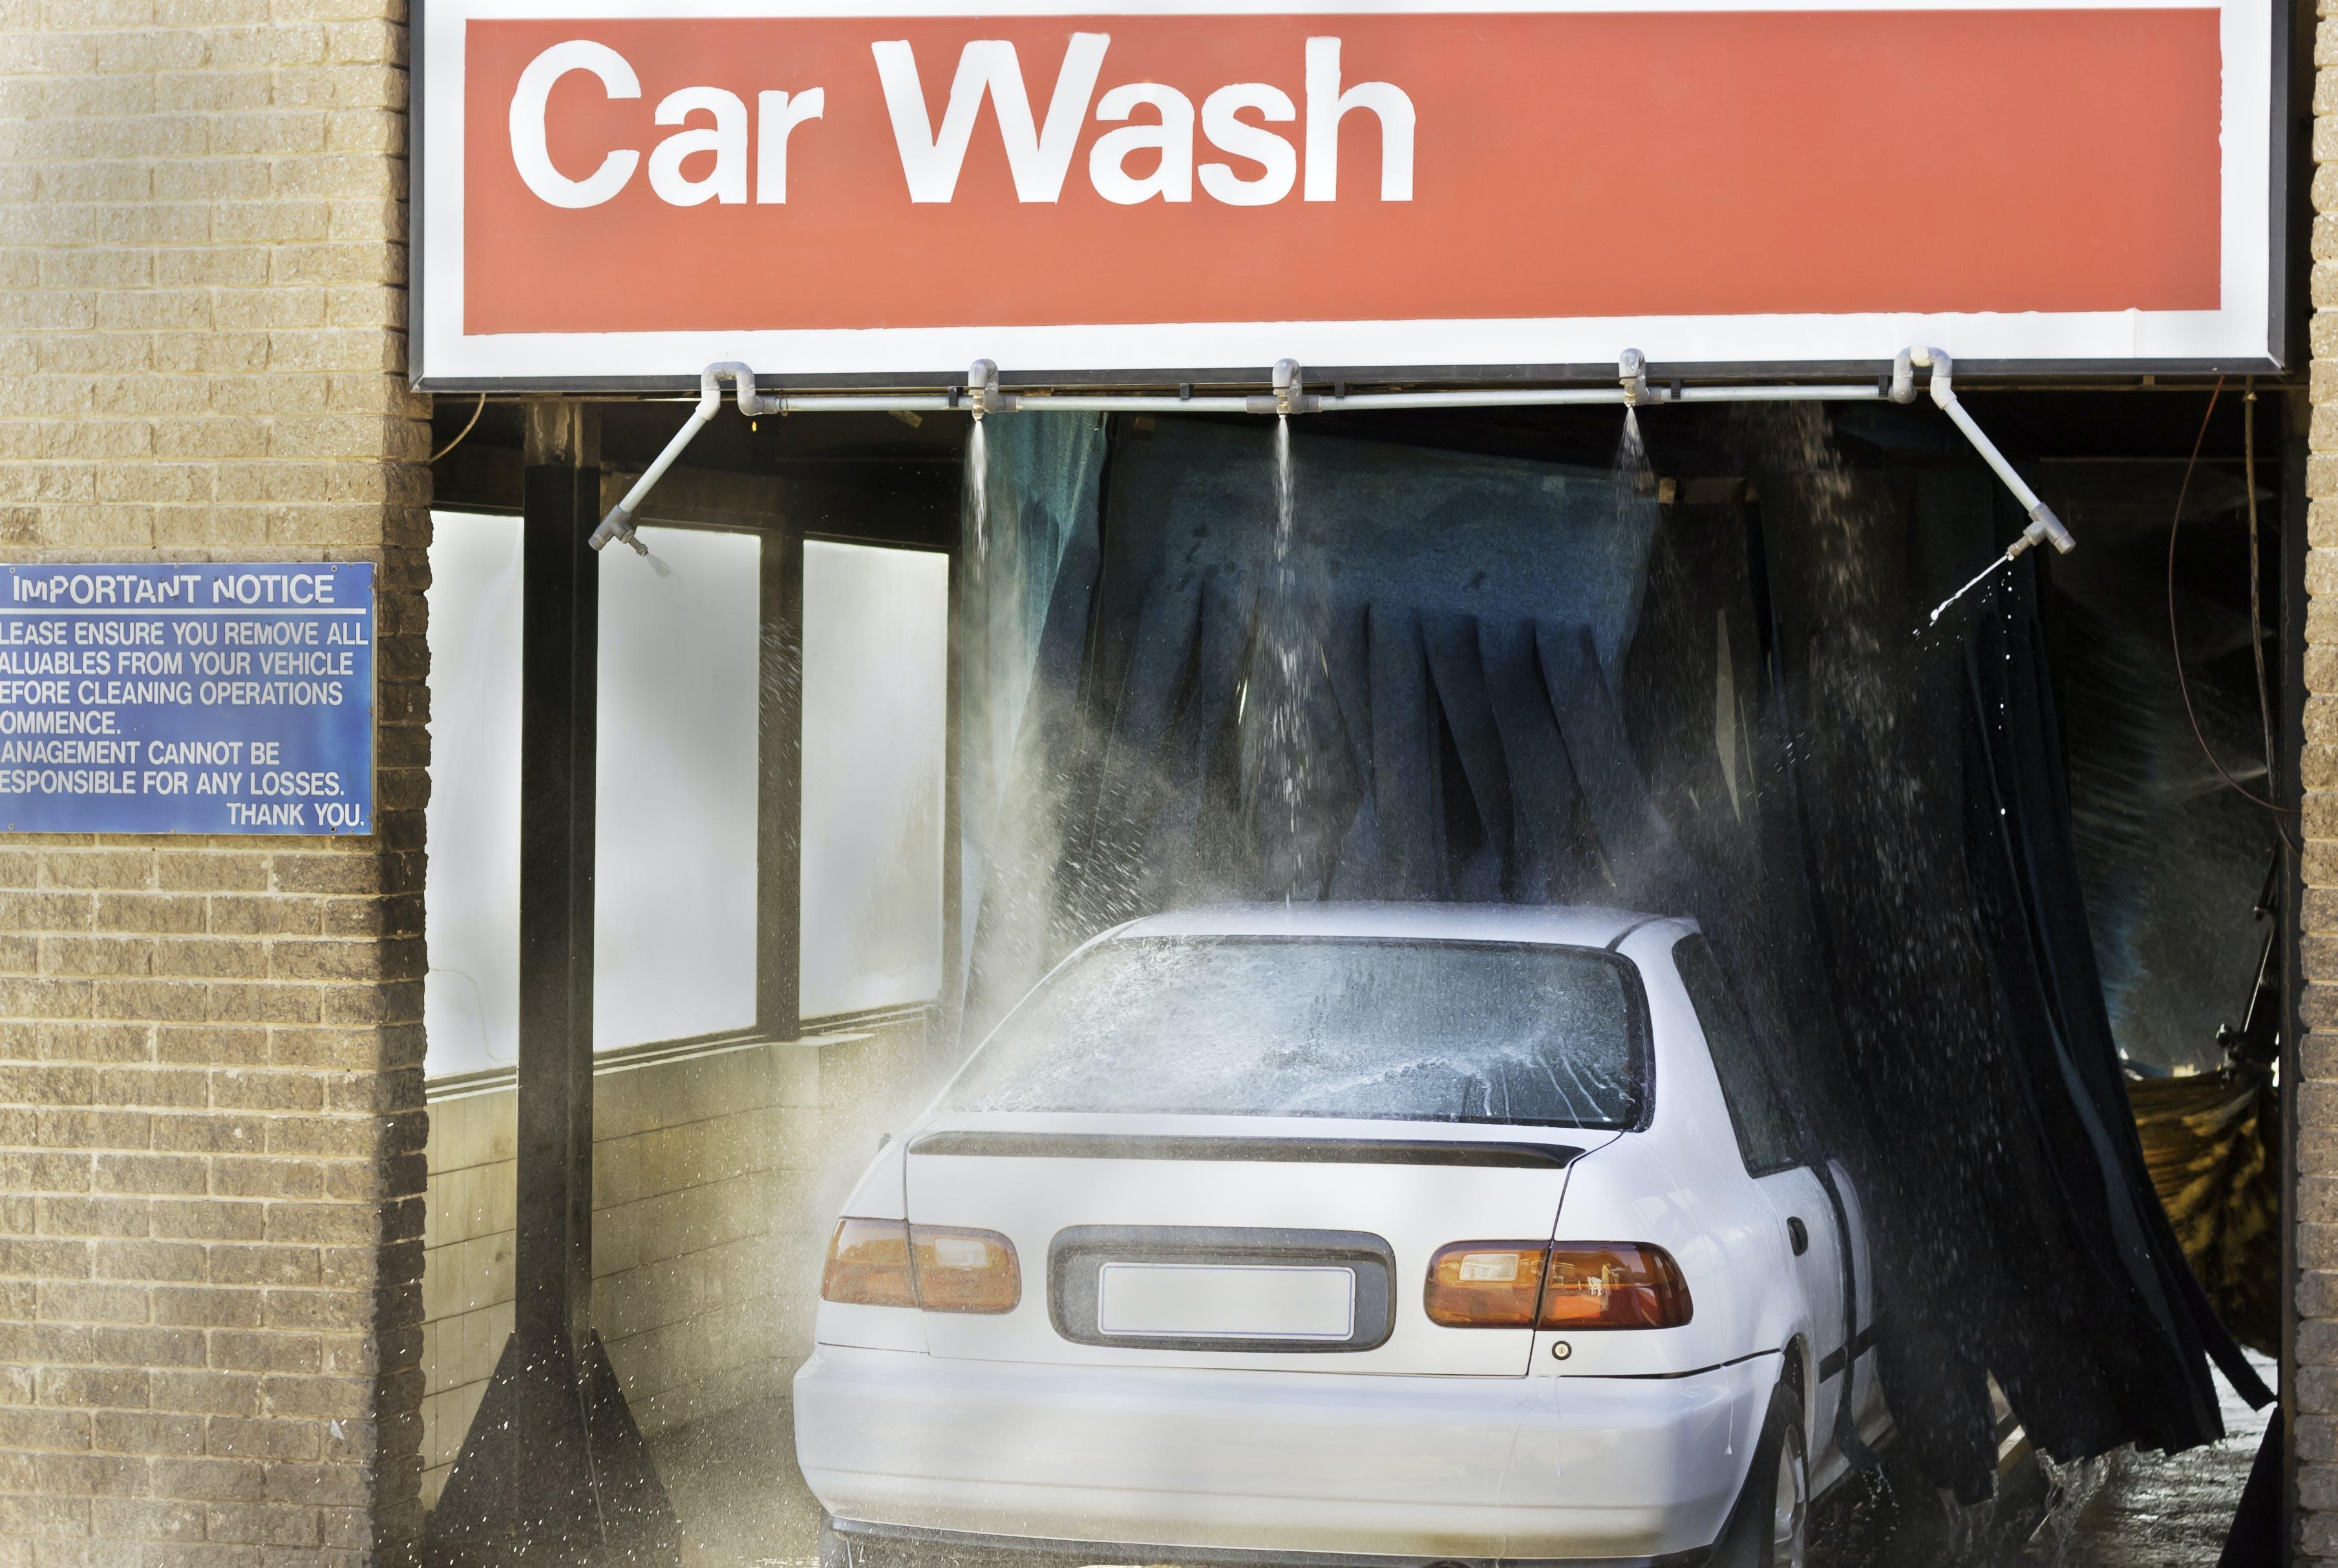 Gas Station Car Wash: Good Idea? | CARFAX